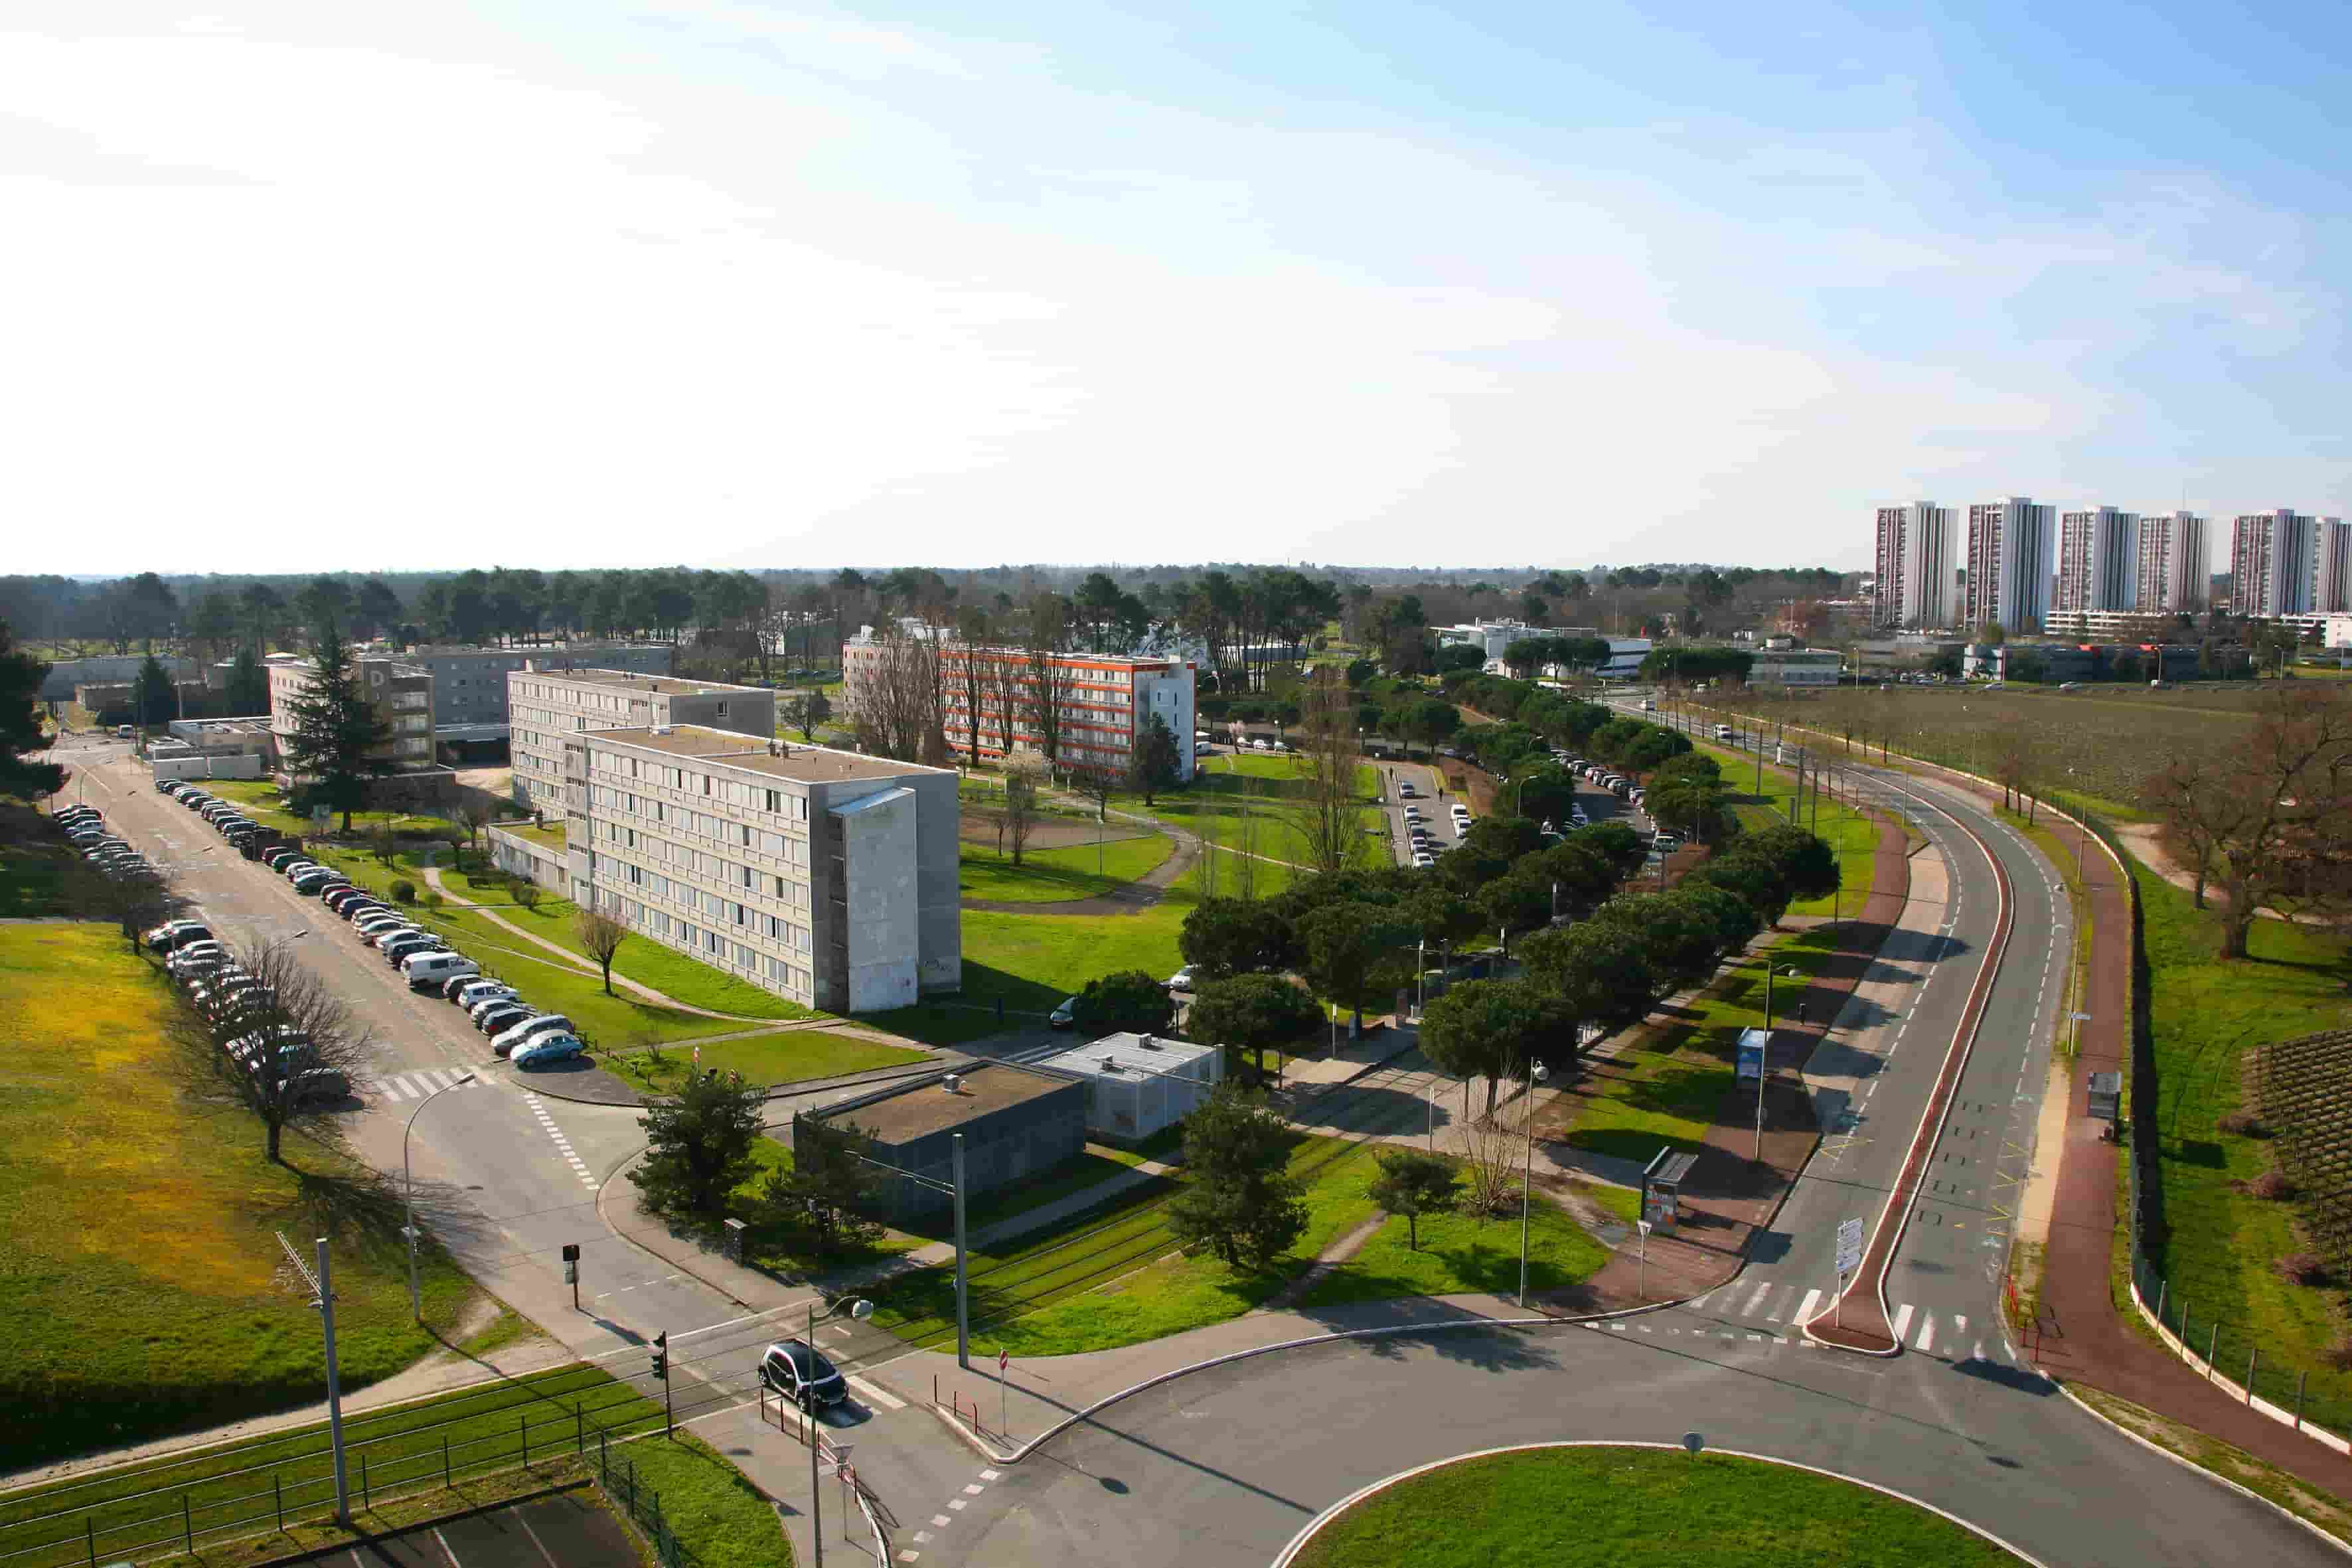 Photographie aérienne d'urbanisme en Gironde